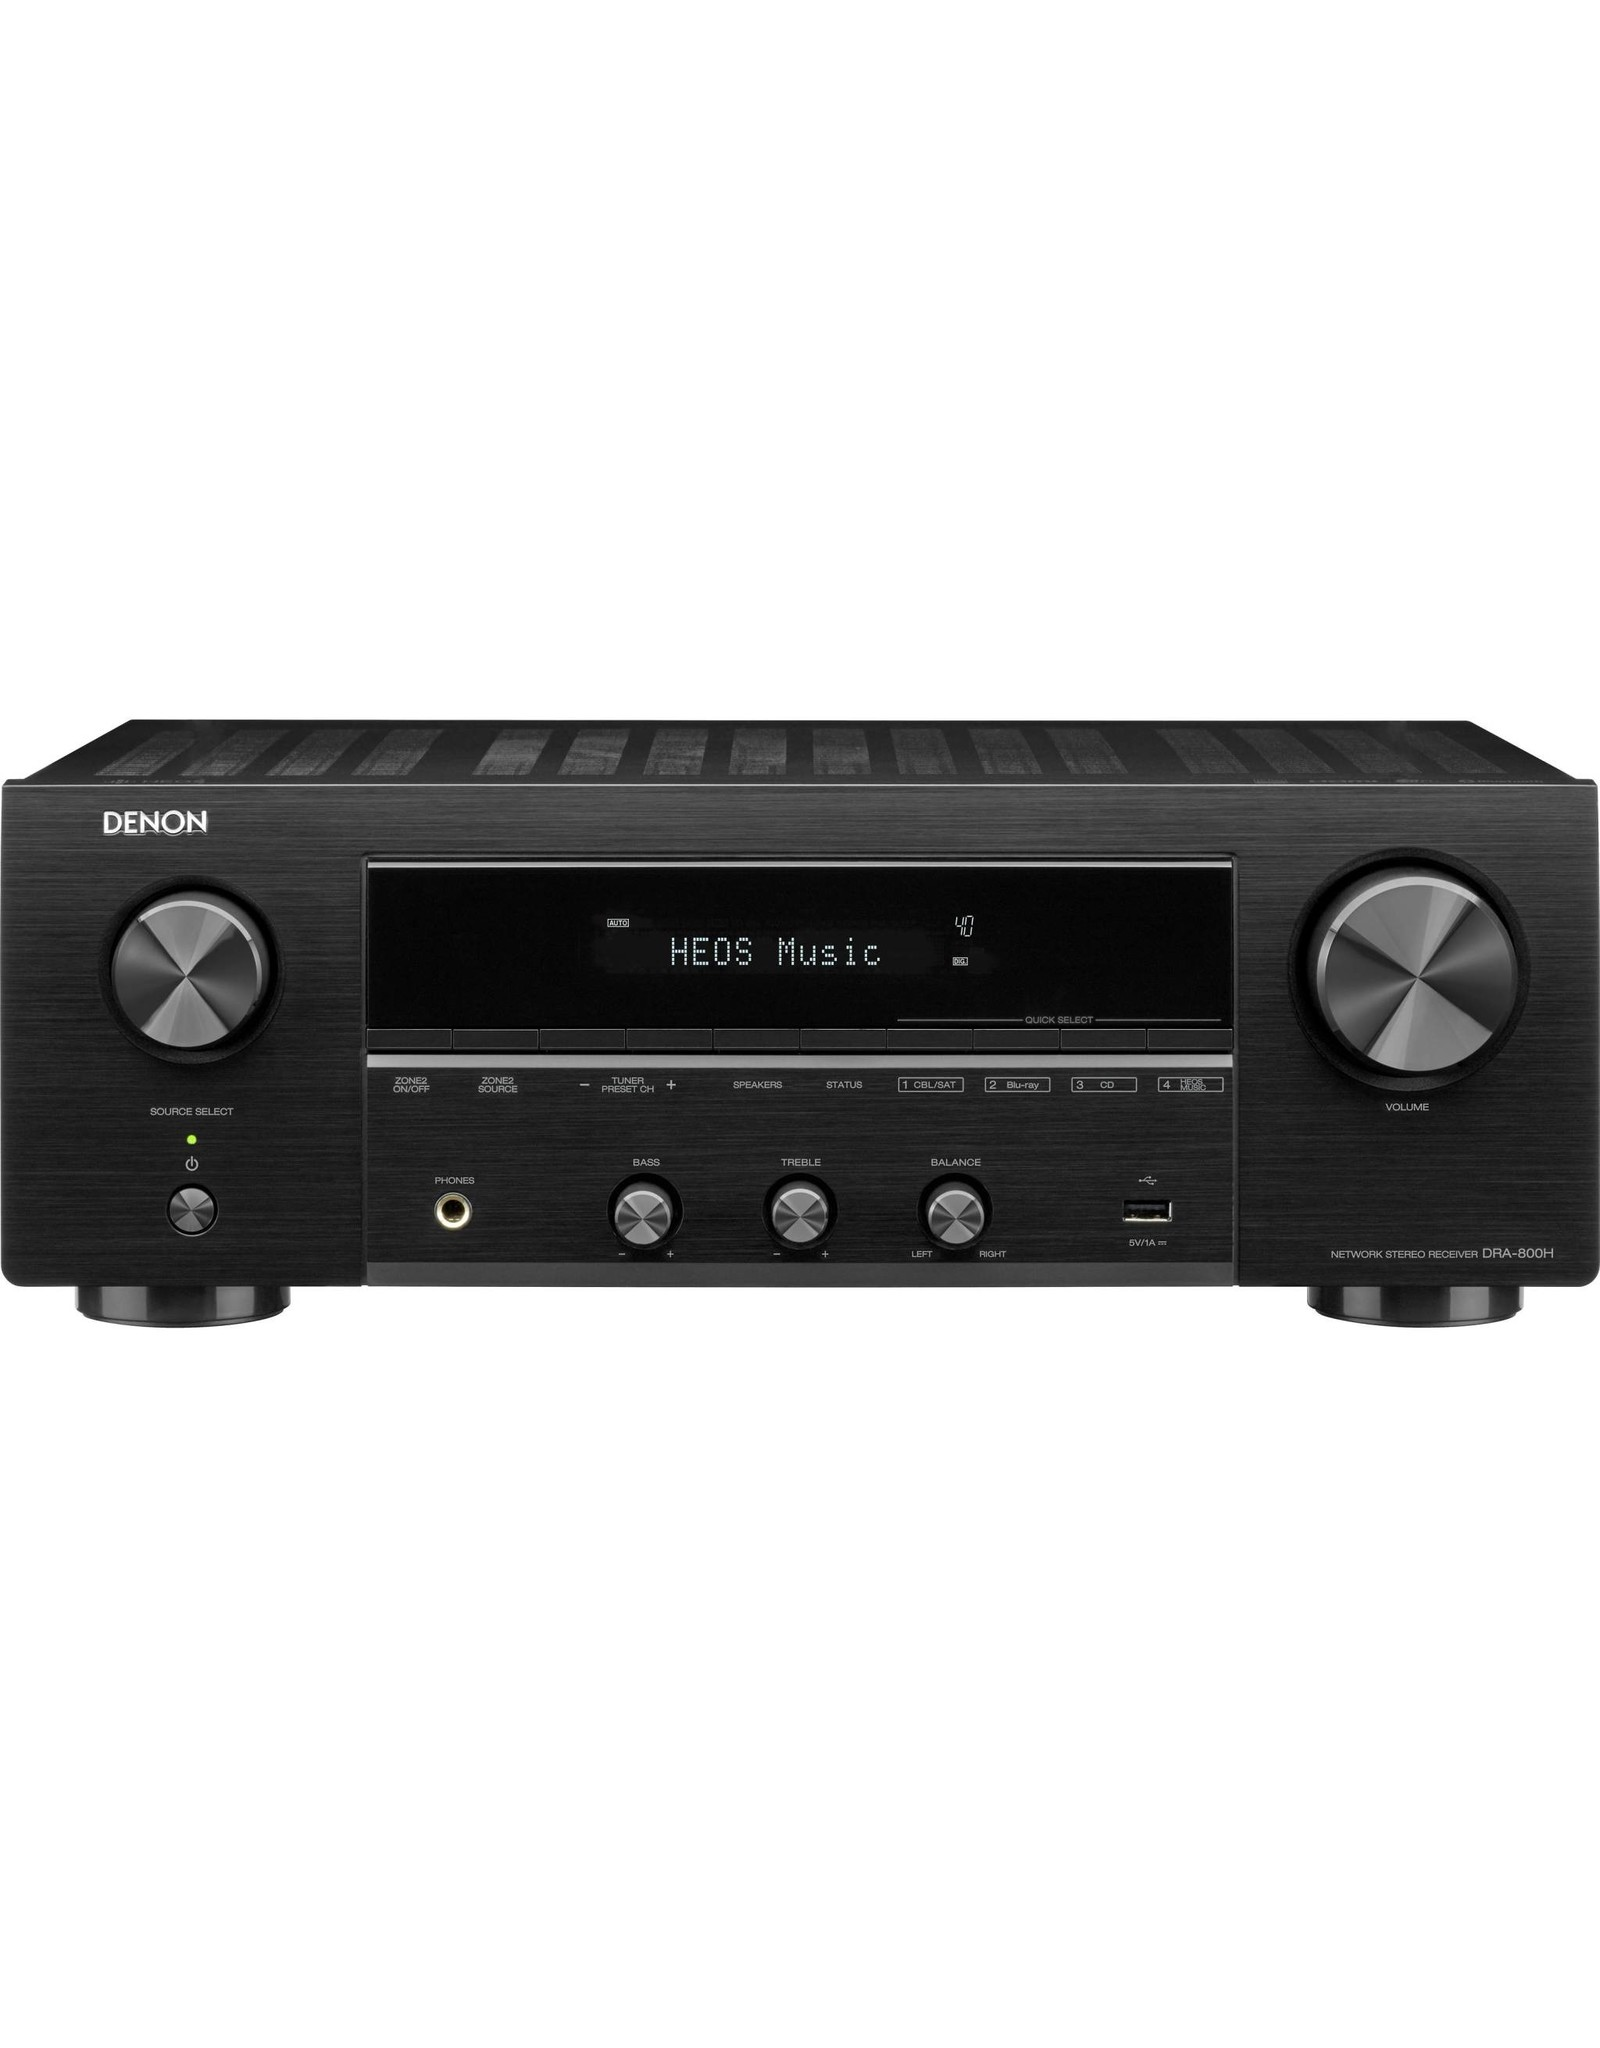 Denon Denon DRA-800H Stereo Receiver